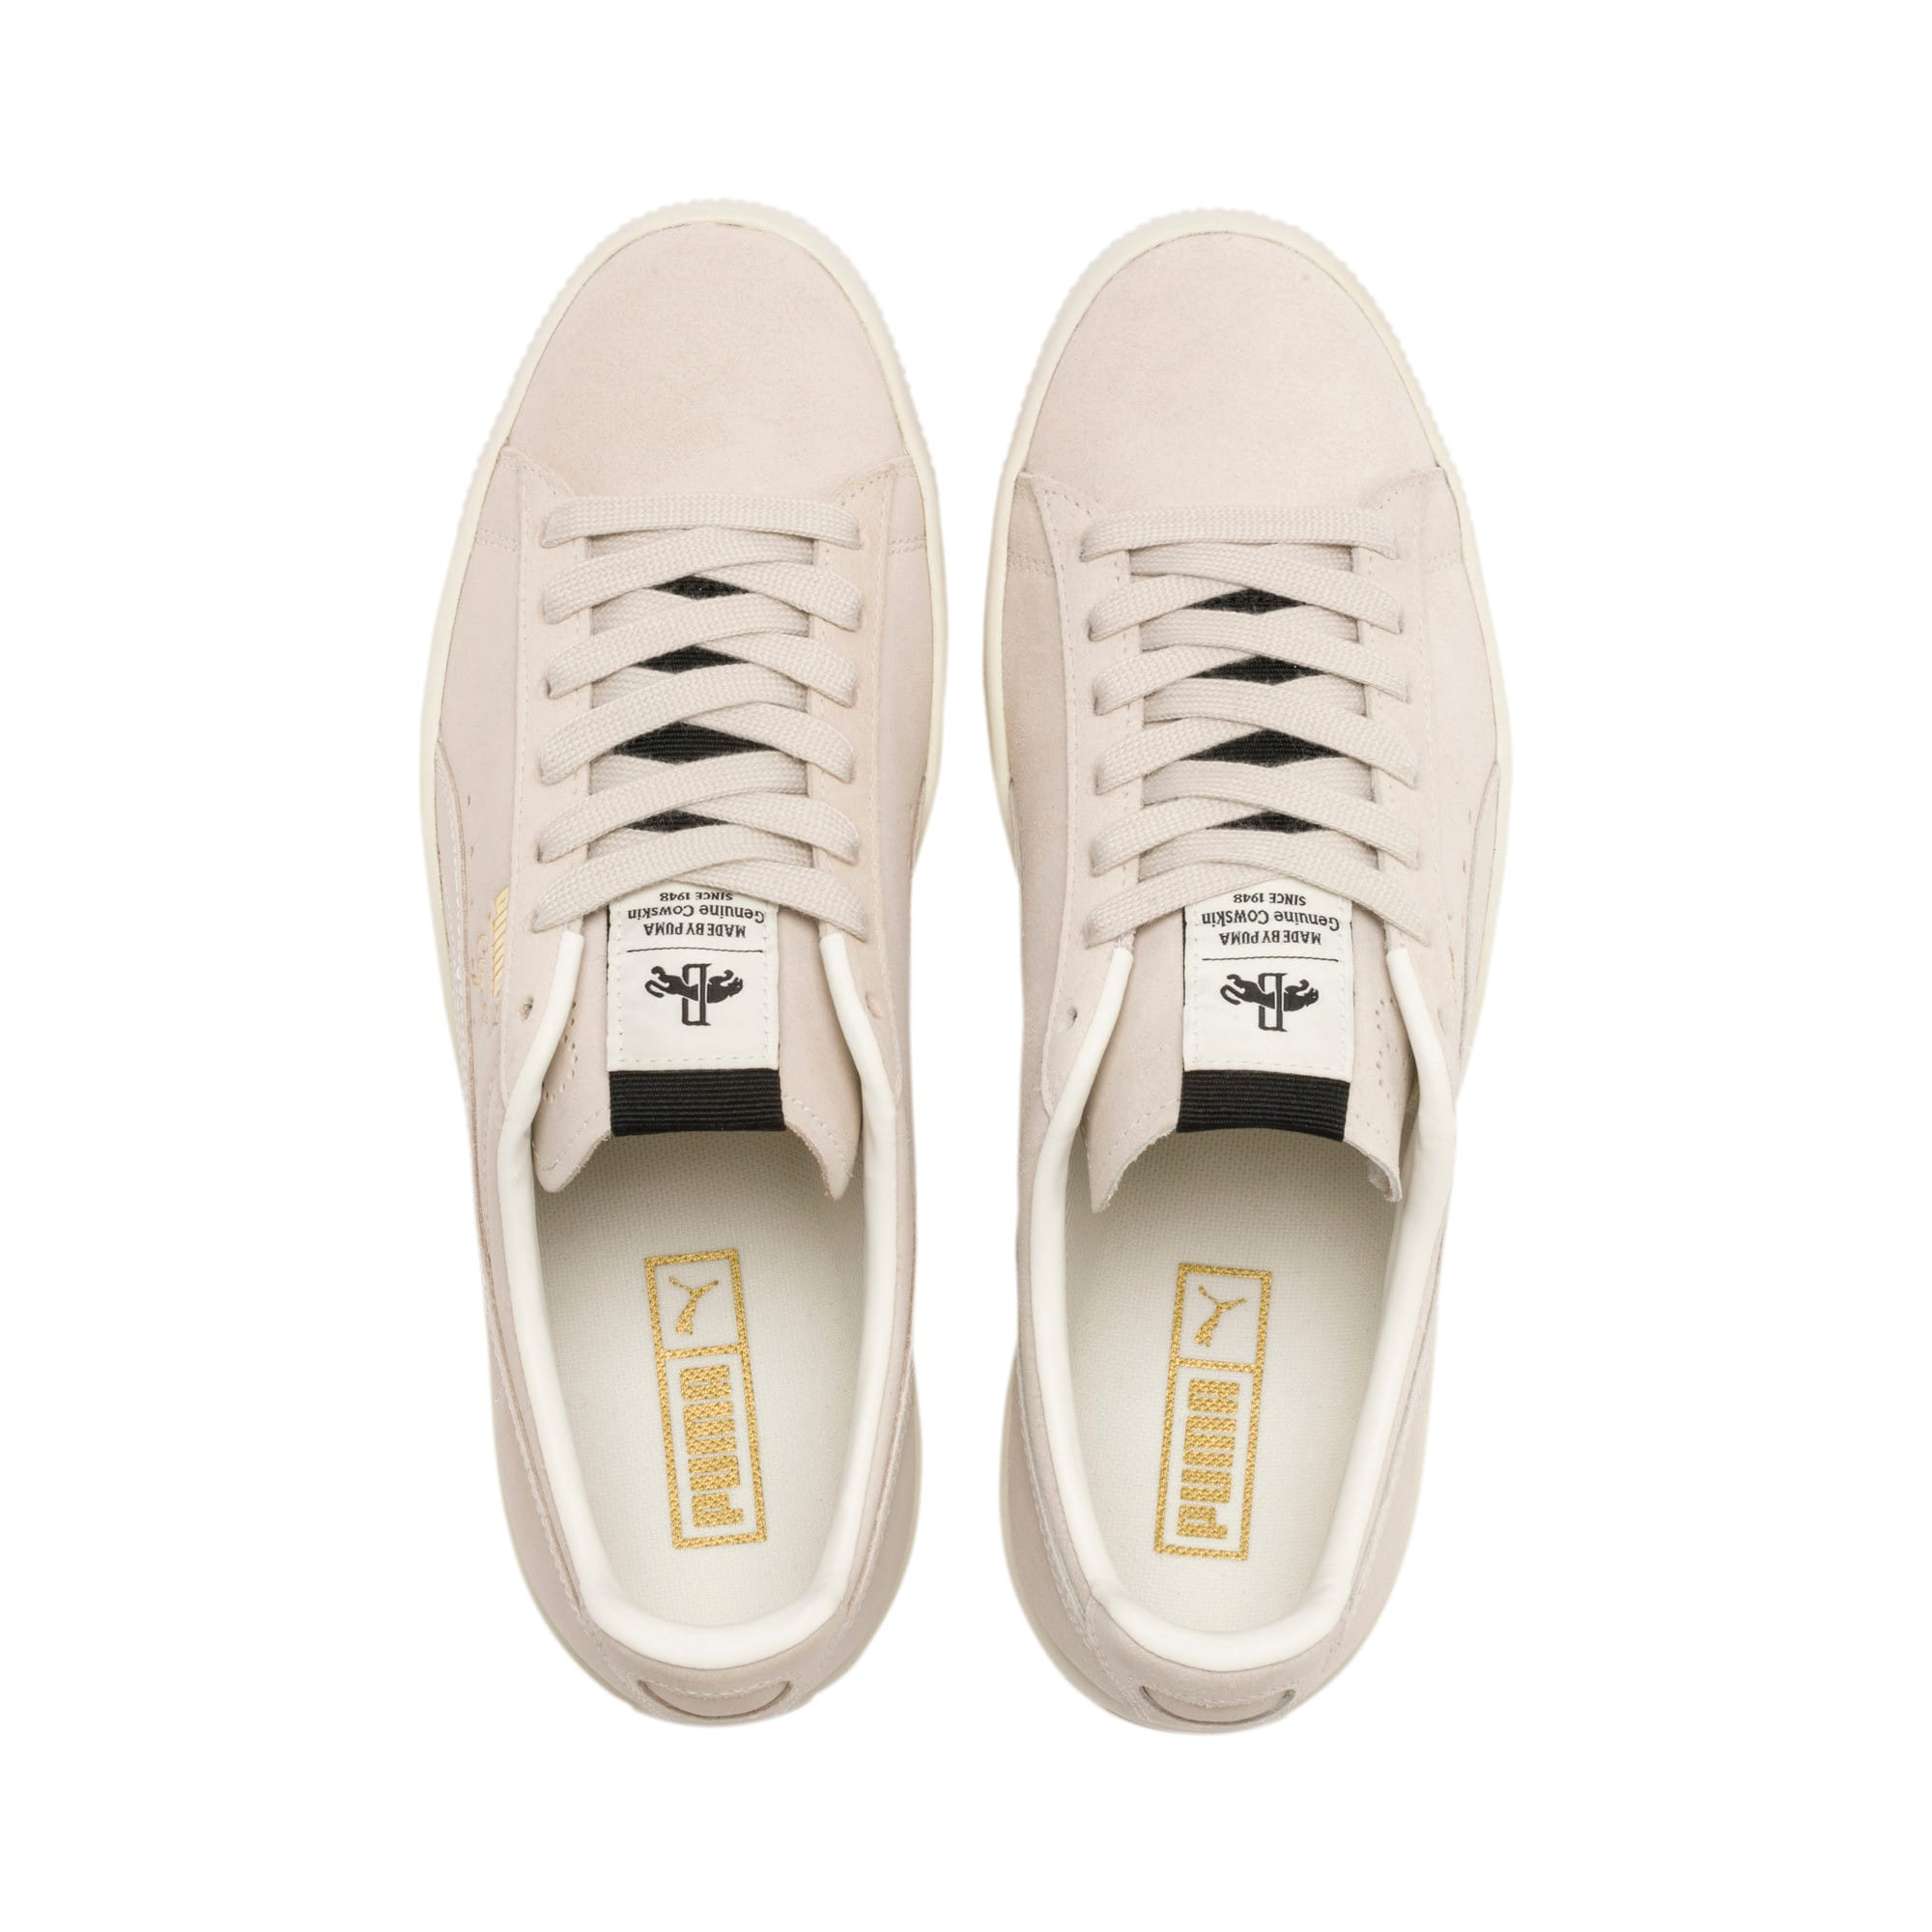 Thumbnail 7 of Clyde Fedora Sneakers, Whisper Wht-P Blk-WhisperWht, medium